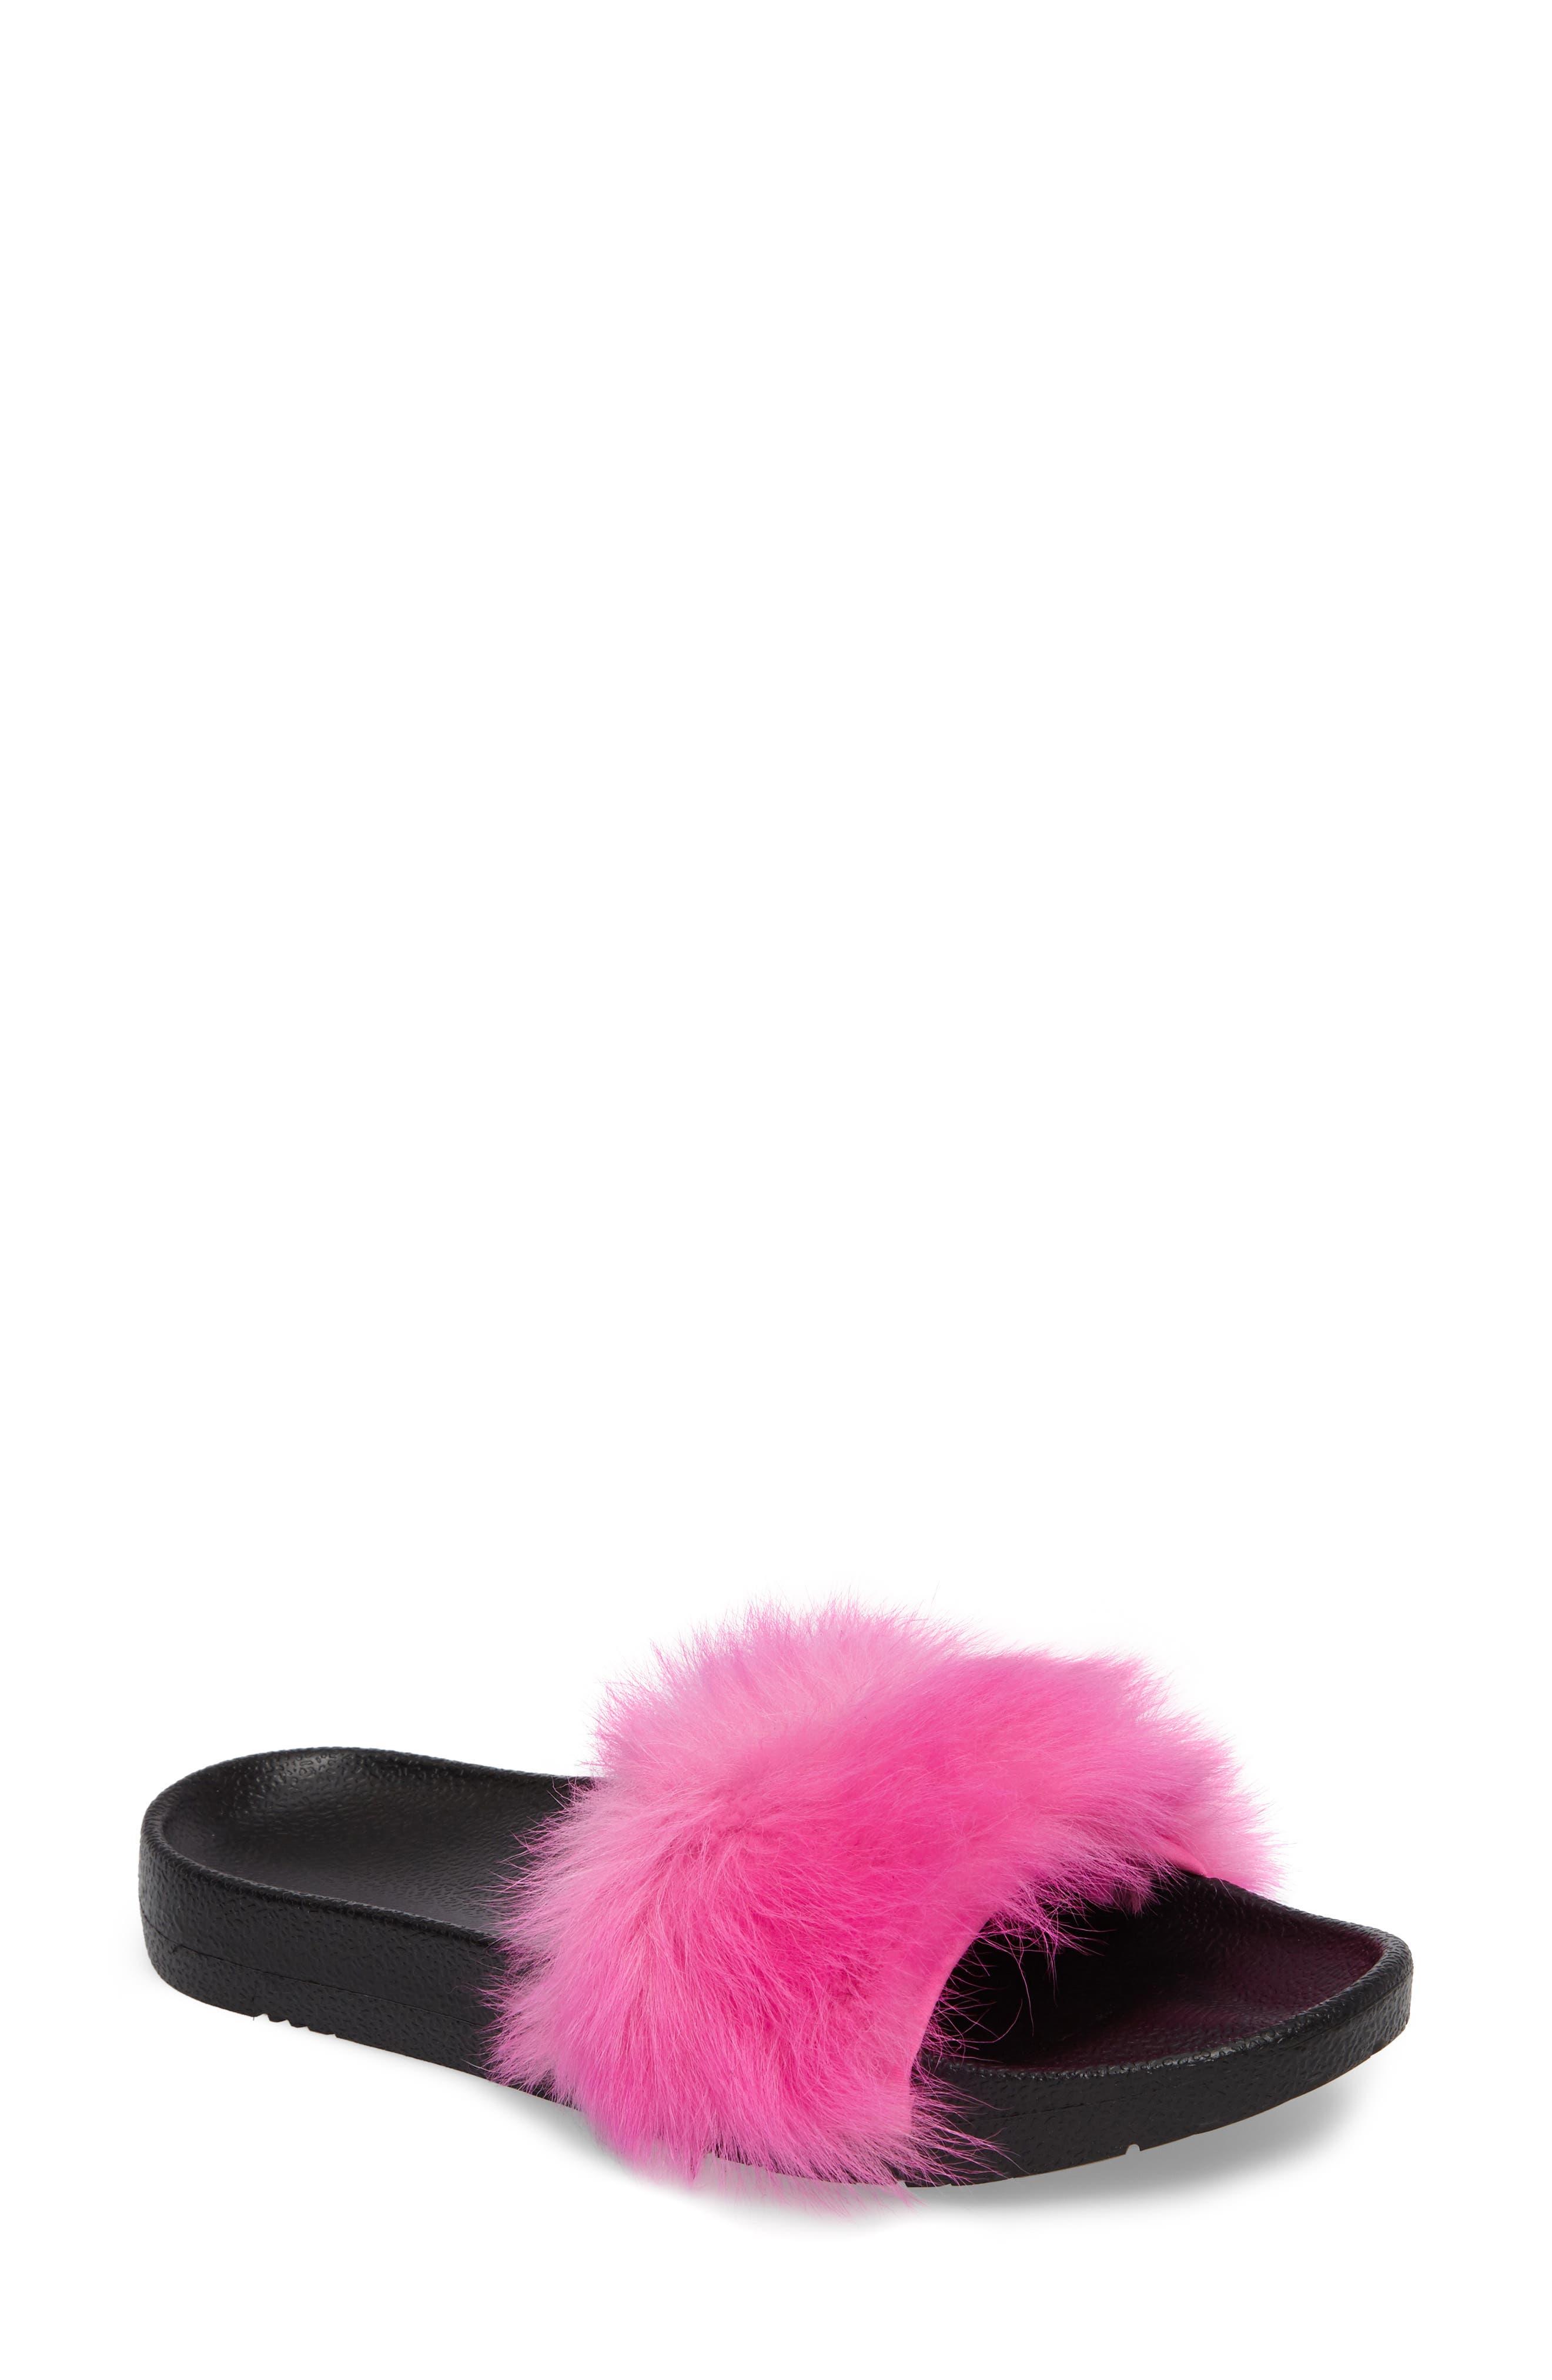 Royale Genuine Shearling Slide Sandal,                         Main,                         color, Neon Pink